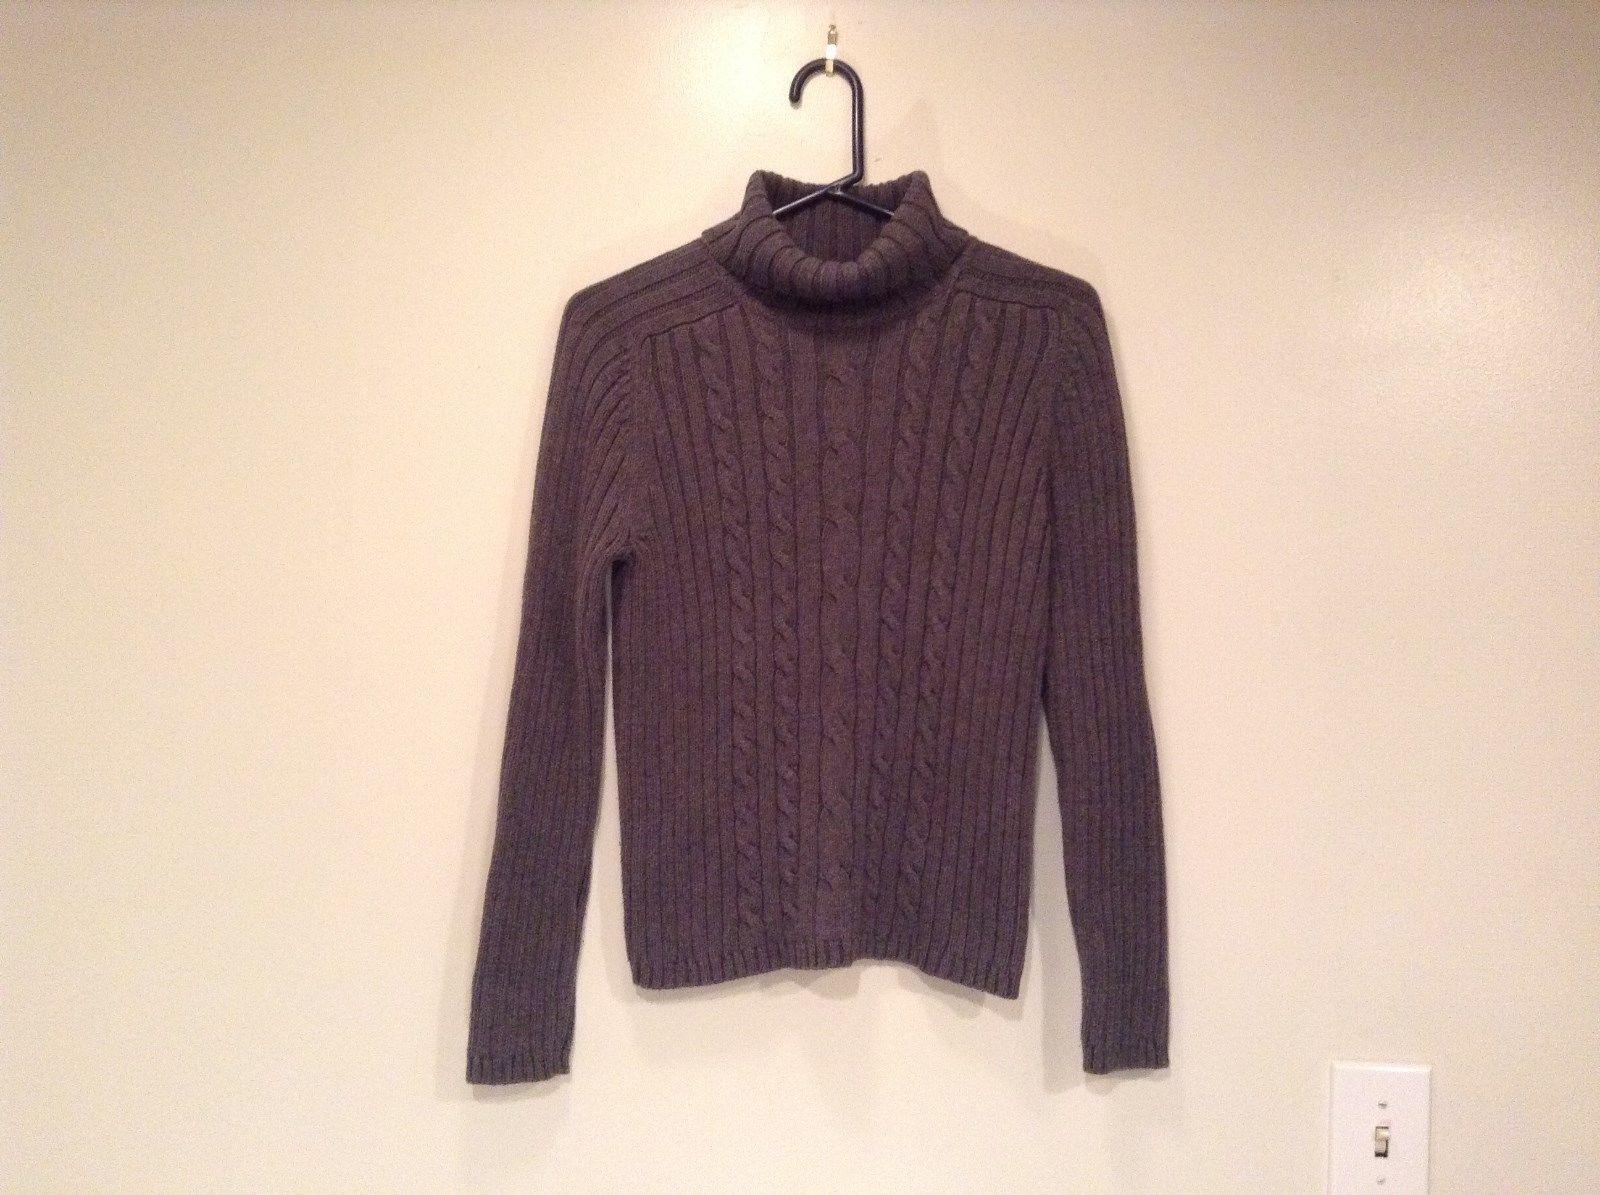 Dark Gray Knitted Turtleneck Sweater Marsh Landing Size M 100 Percent Cotton